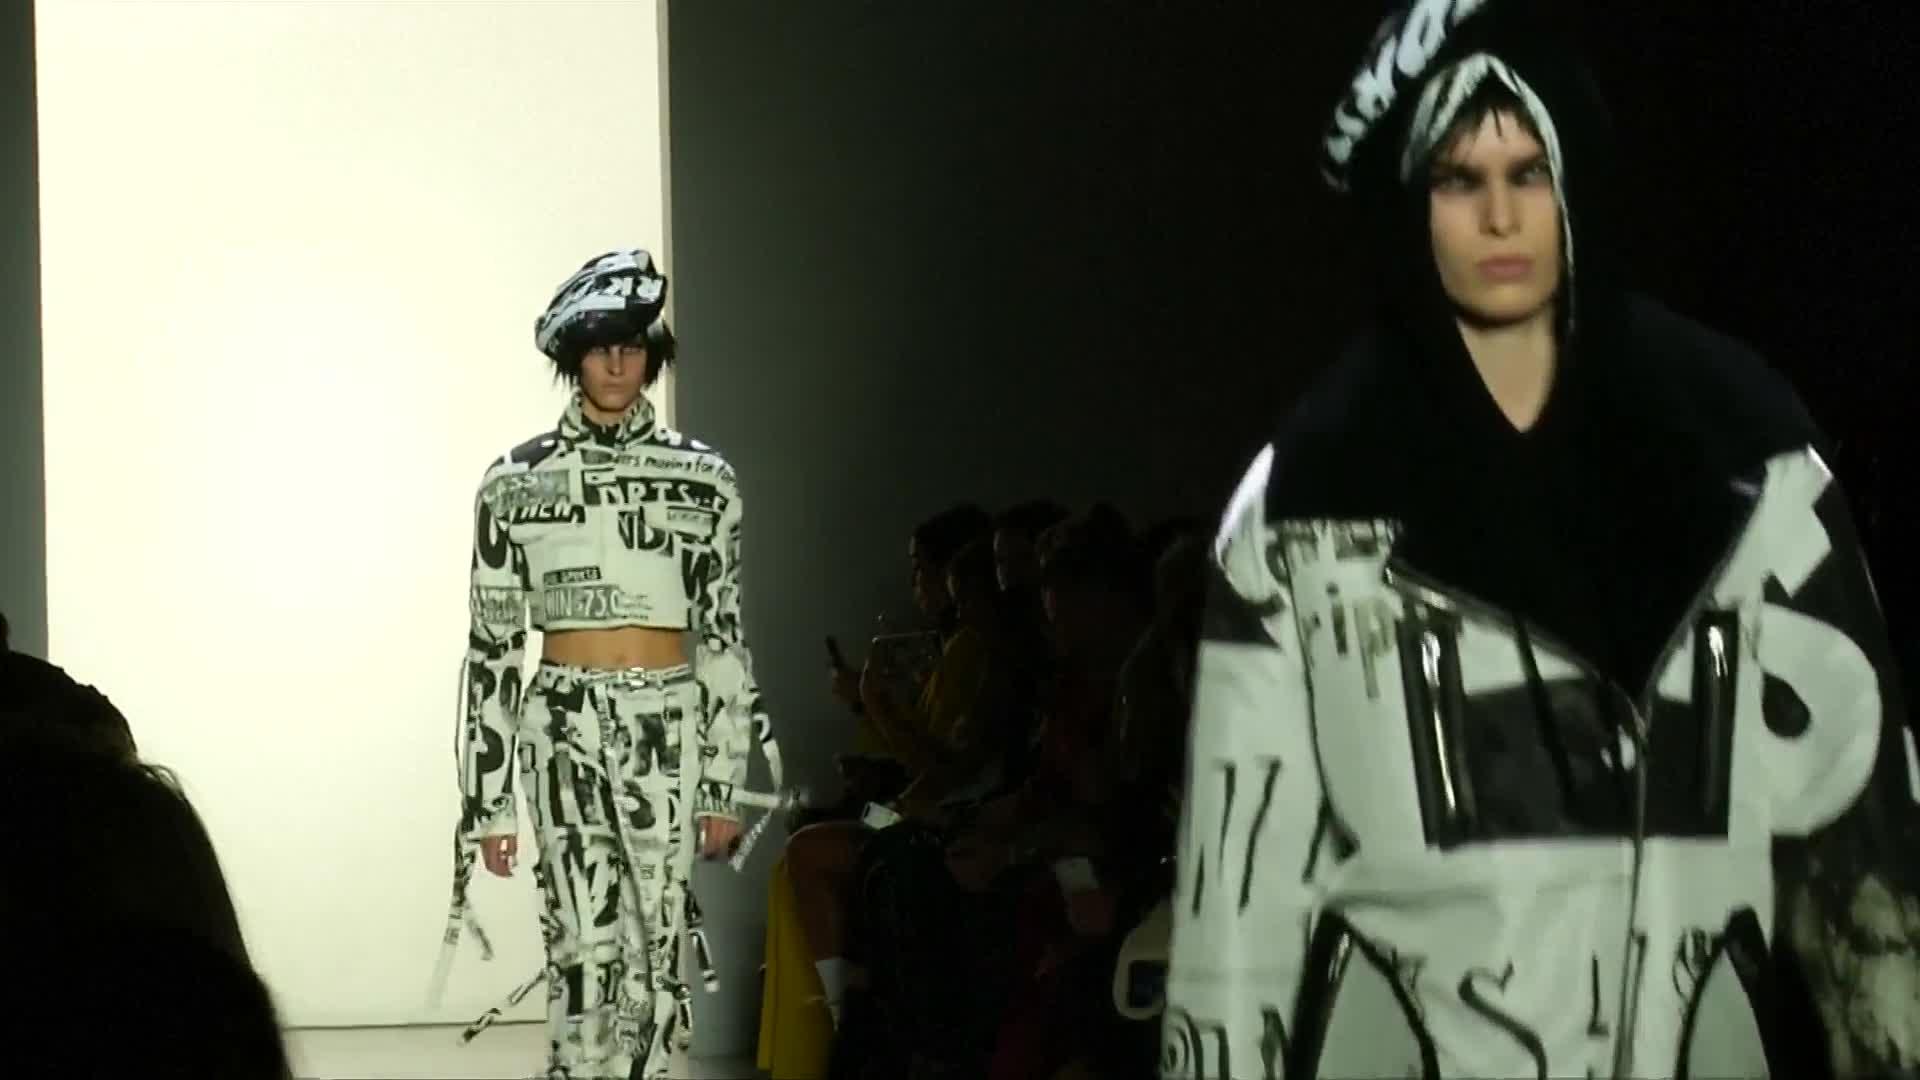 NYFW: Jeremy Scott takes street style grunge to a whole new level